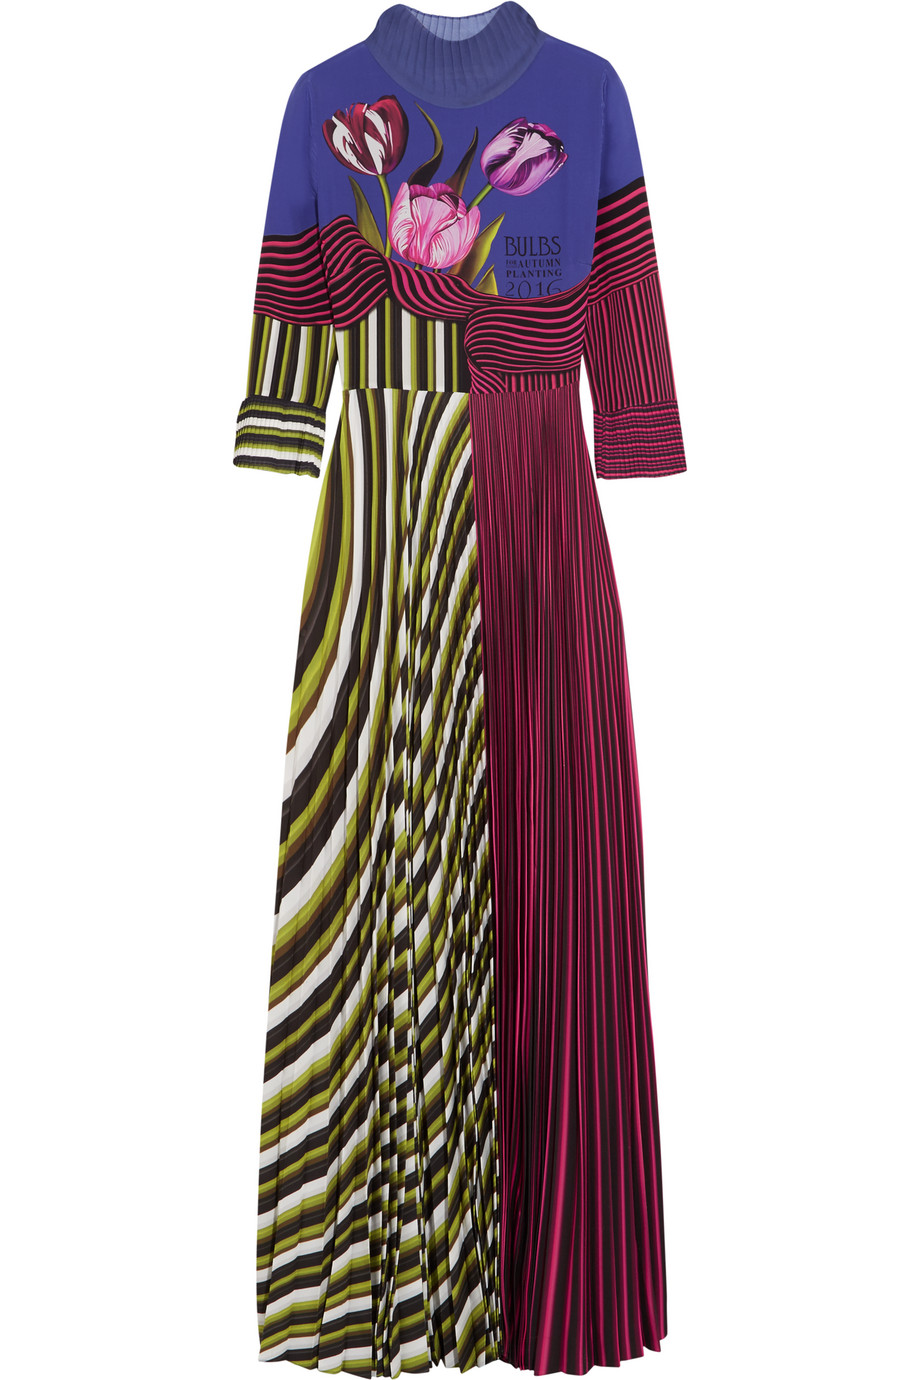 Mary Katrantzou Carni Pleated Printed Crepe De Chine Gown, Burgundy/Dark Purple, Women's - Printed, Size: 8